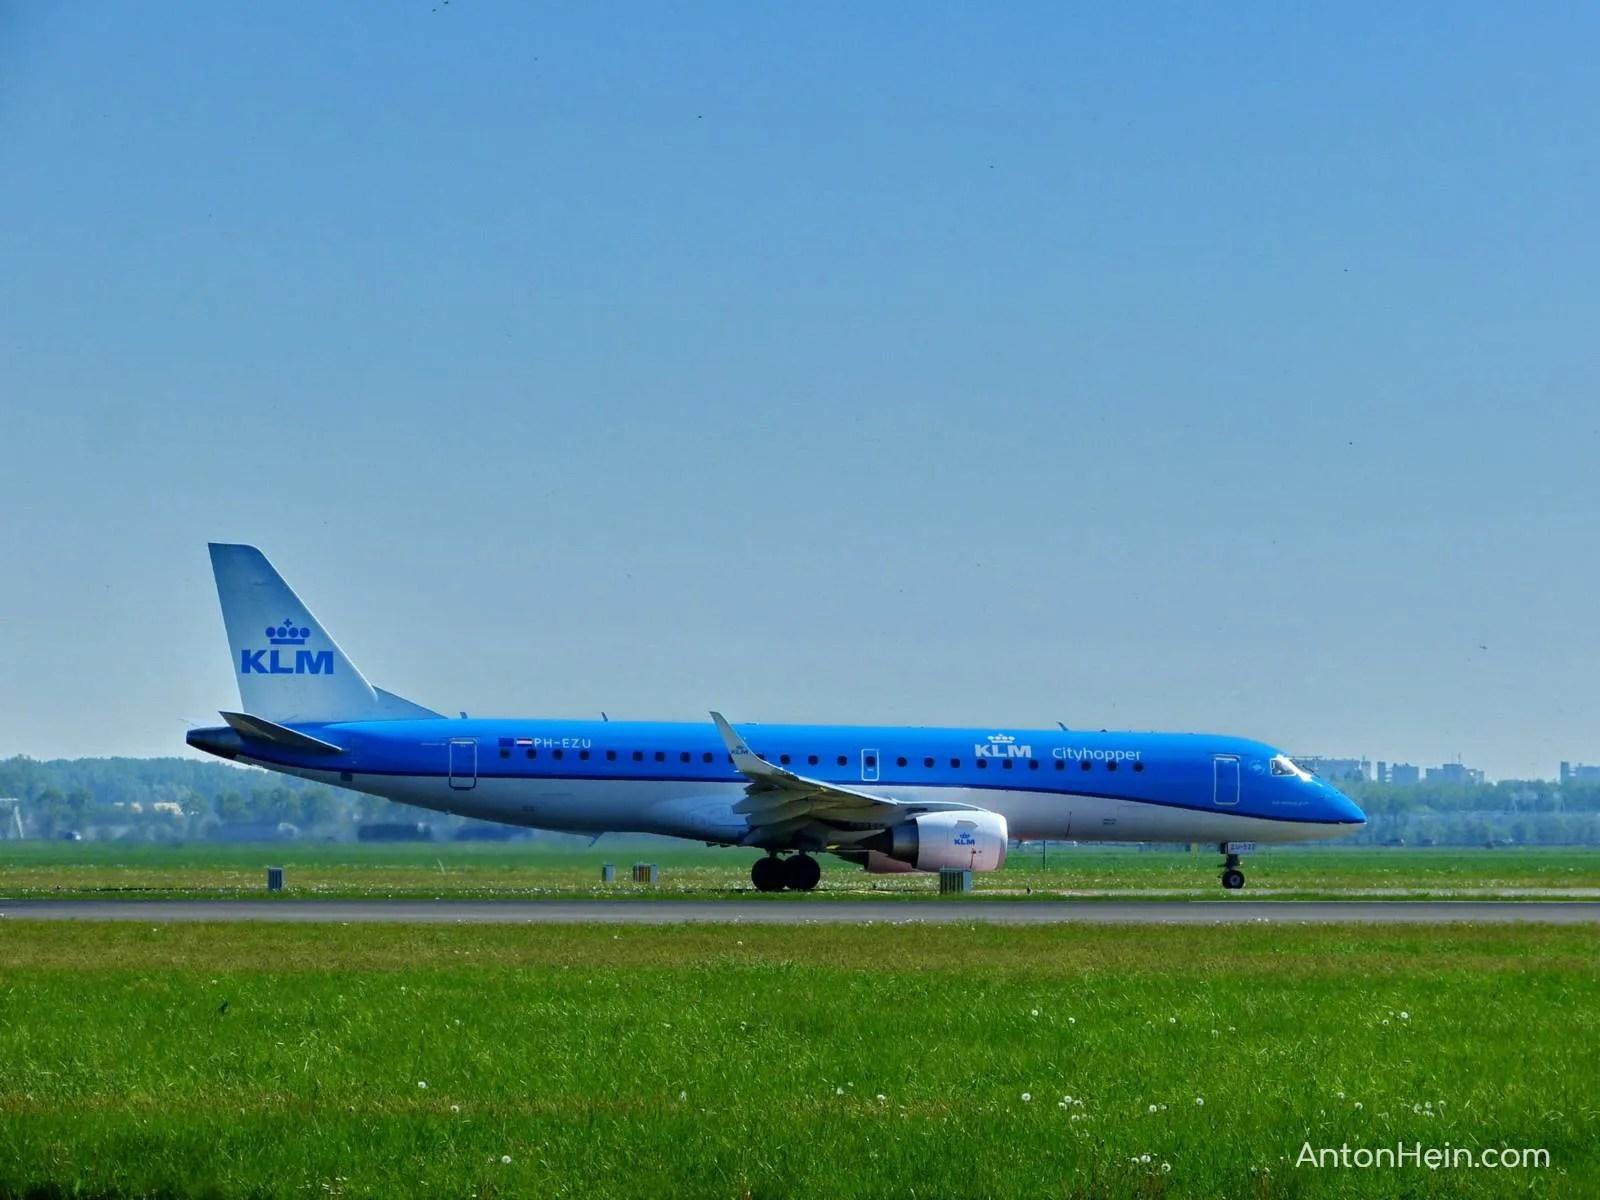 Blue KLM airplanes